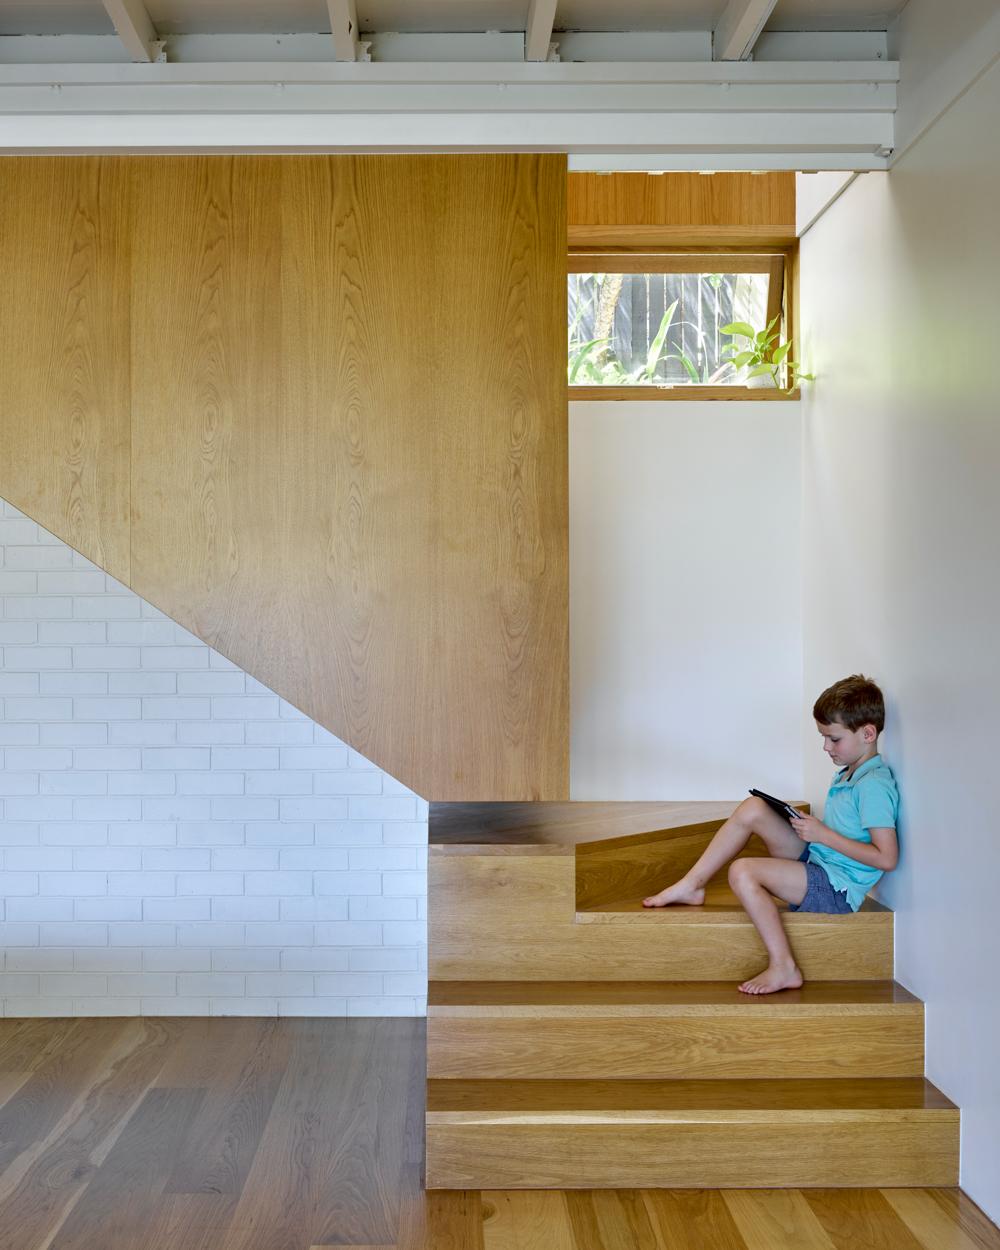 SP Studio - Jacaranda House-the-design-emotive-57156.jpg